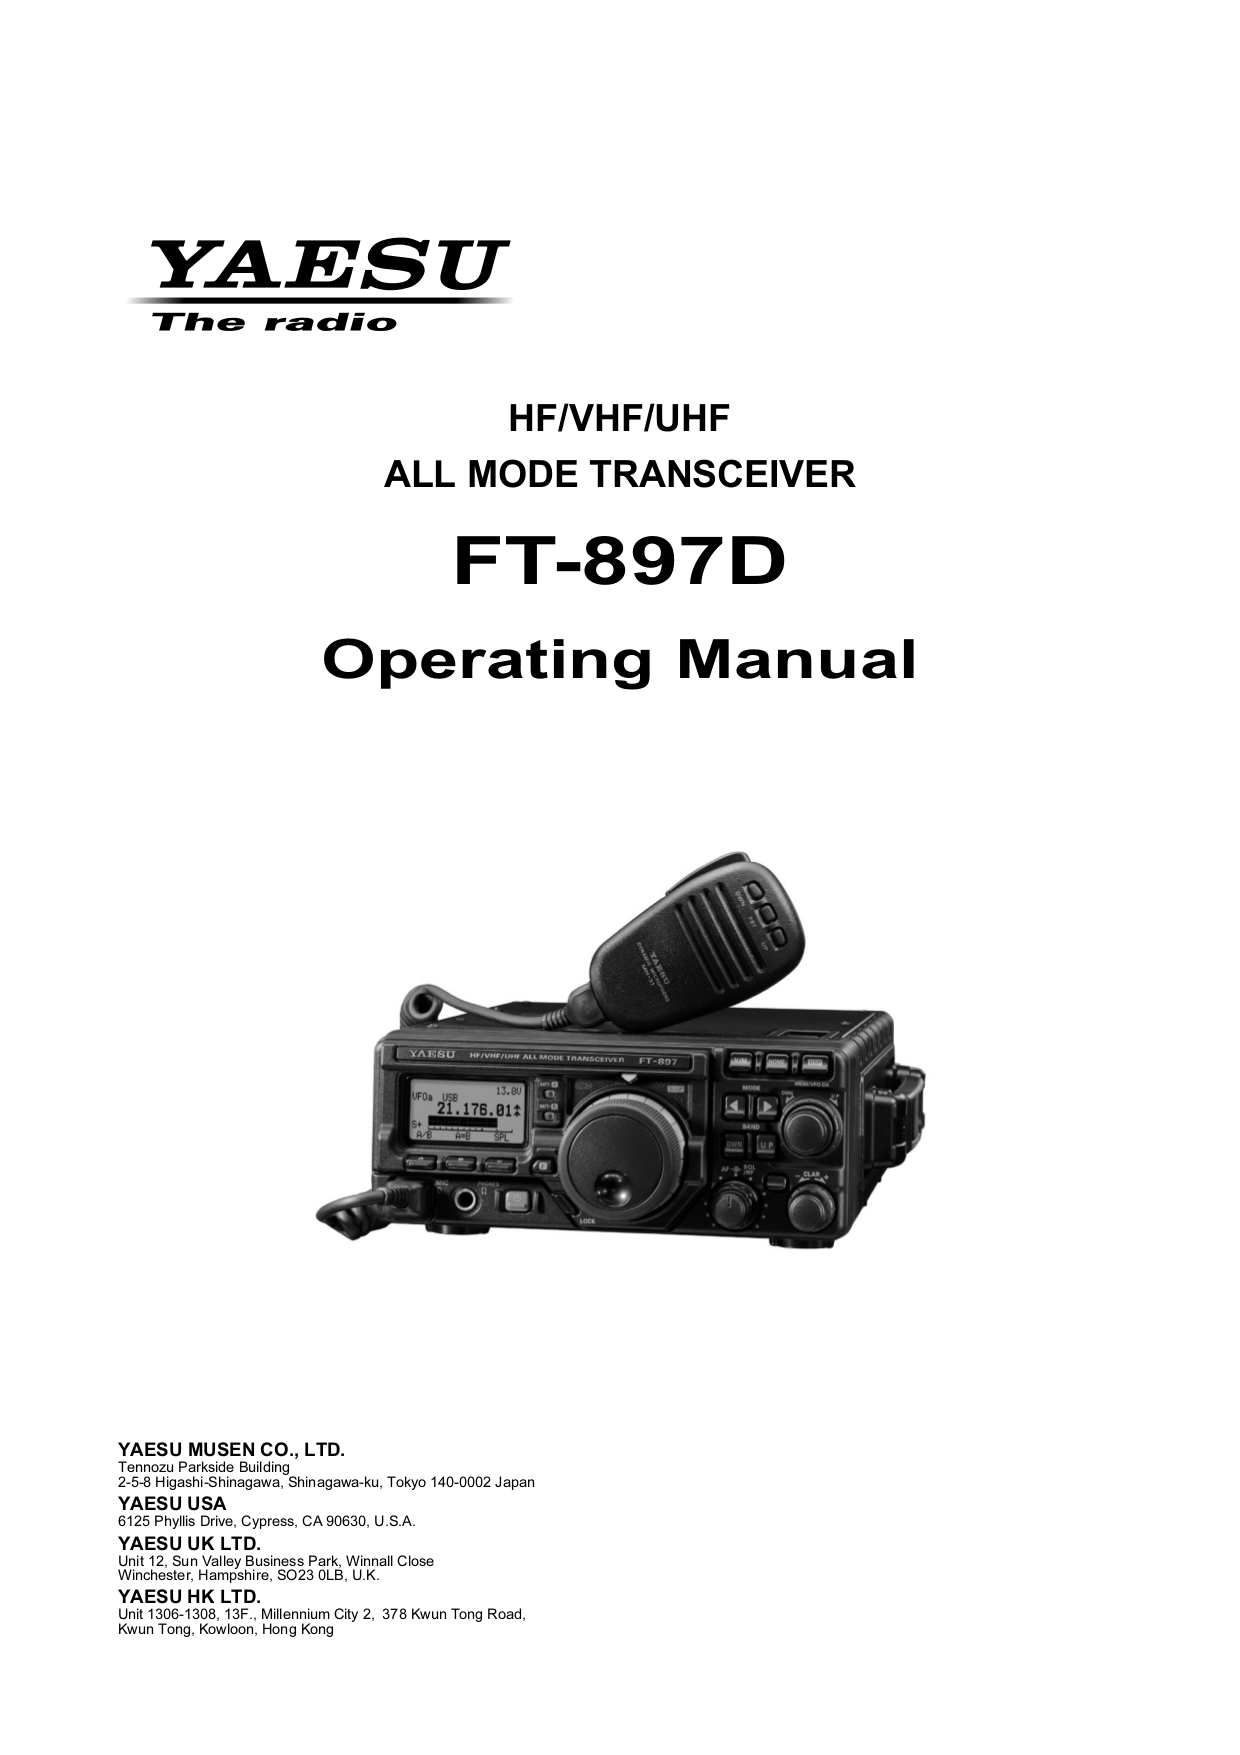 download free pdf for yaesu ft 897d hf transceiver other manual rh umlib com RigPix Yaesu FT 897 FT -897D Manual